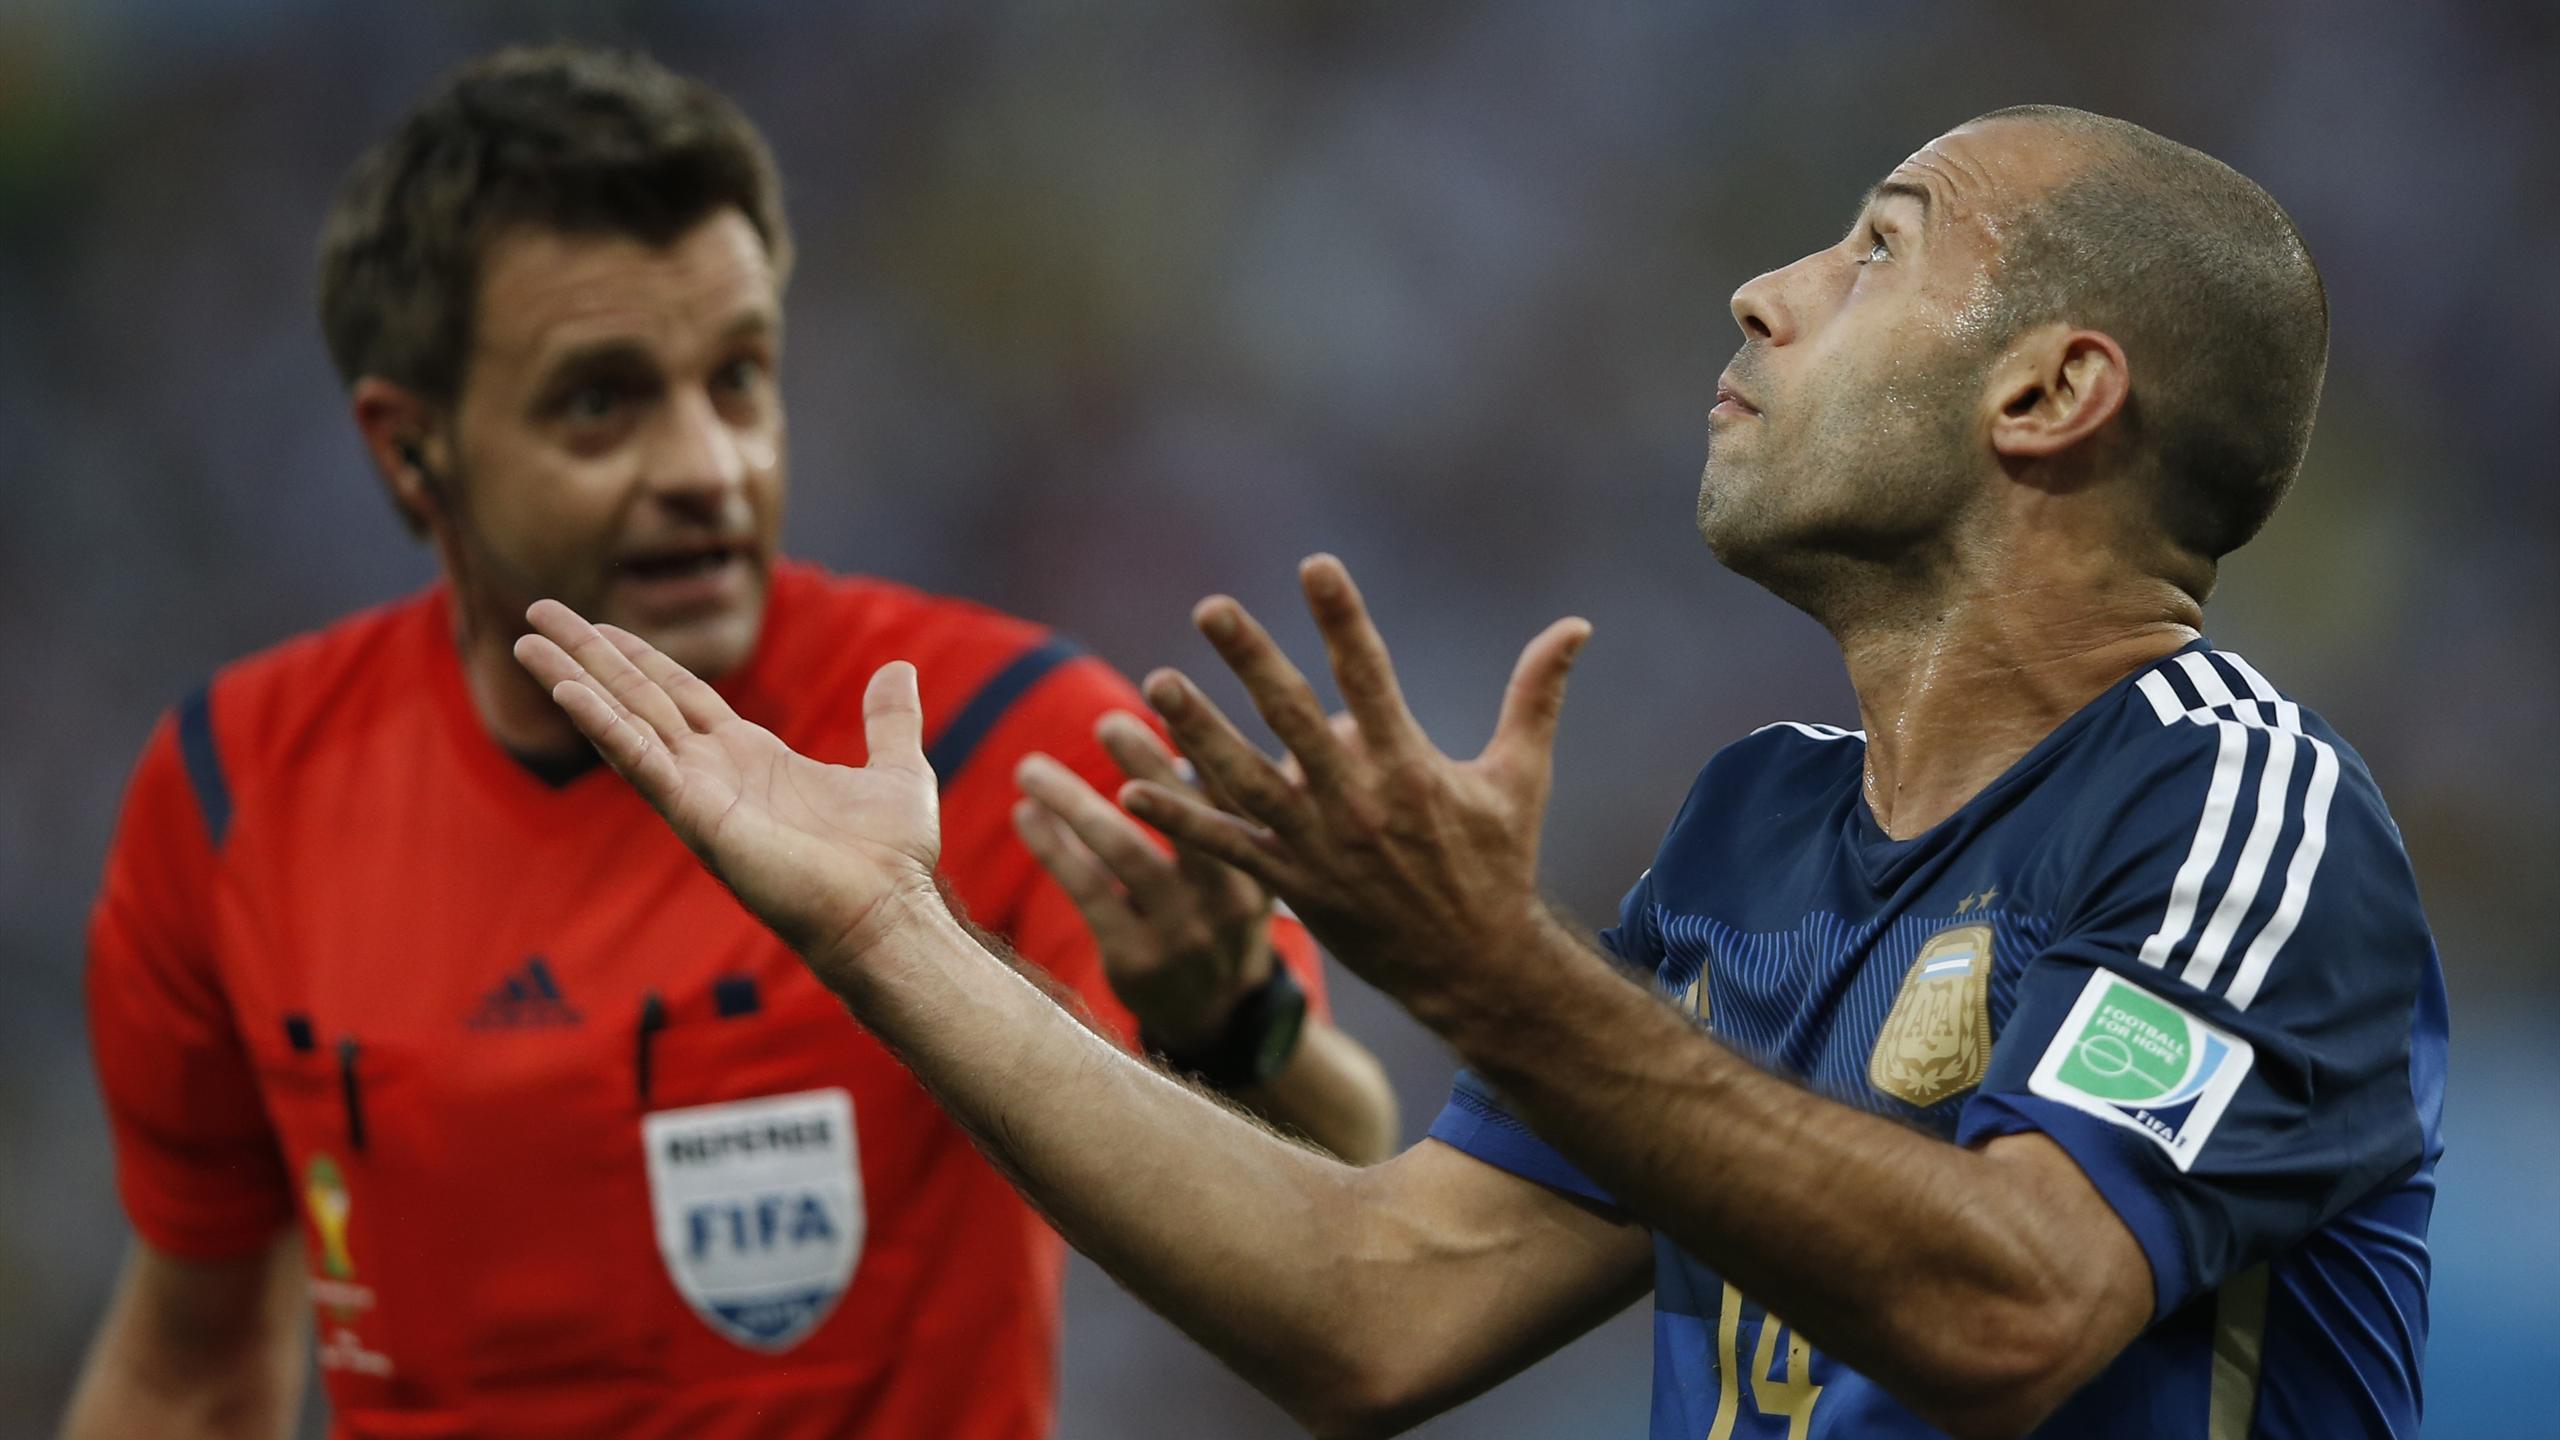 Nicola Rizzoli lors de la finale de la Coupe du monde 2014